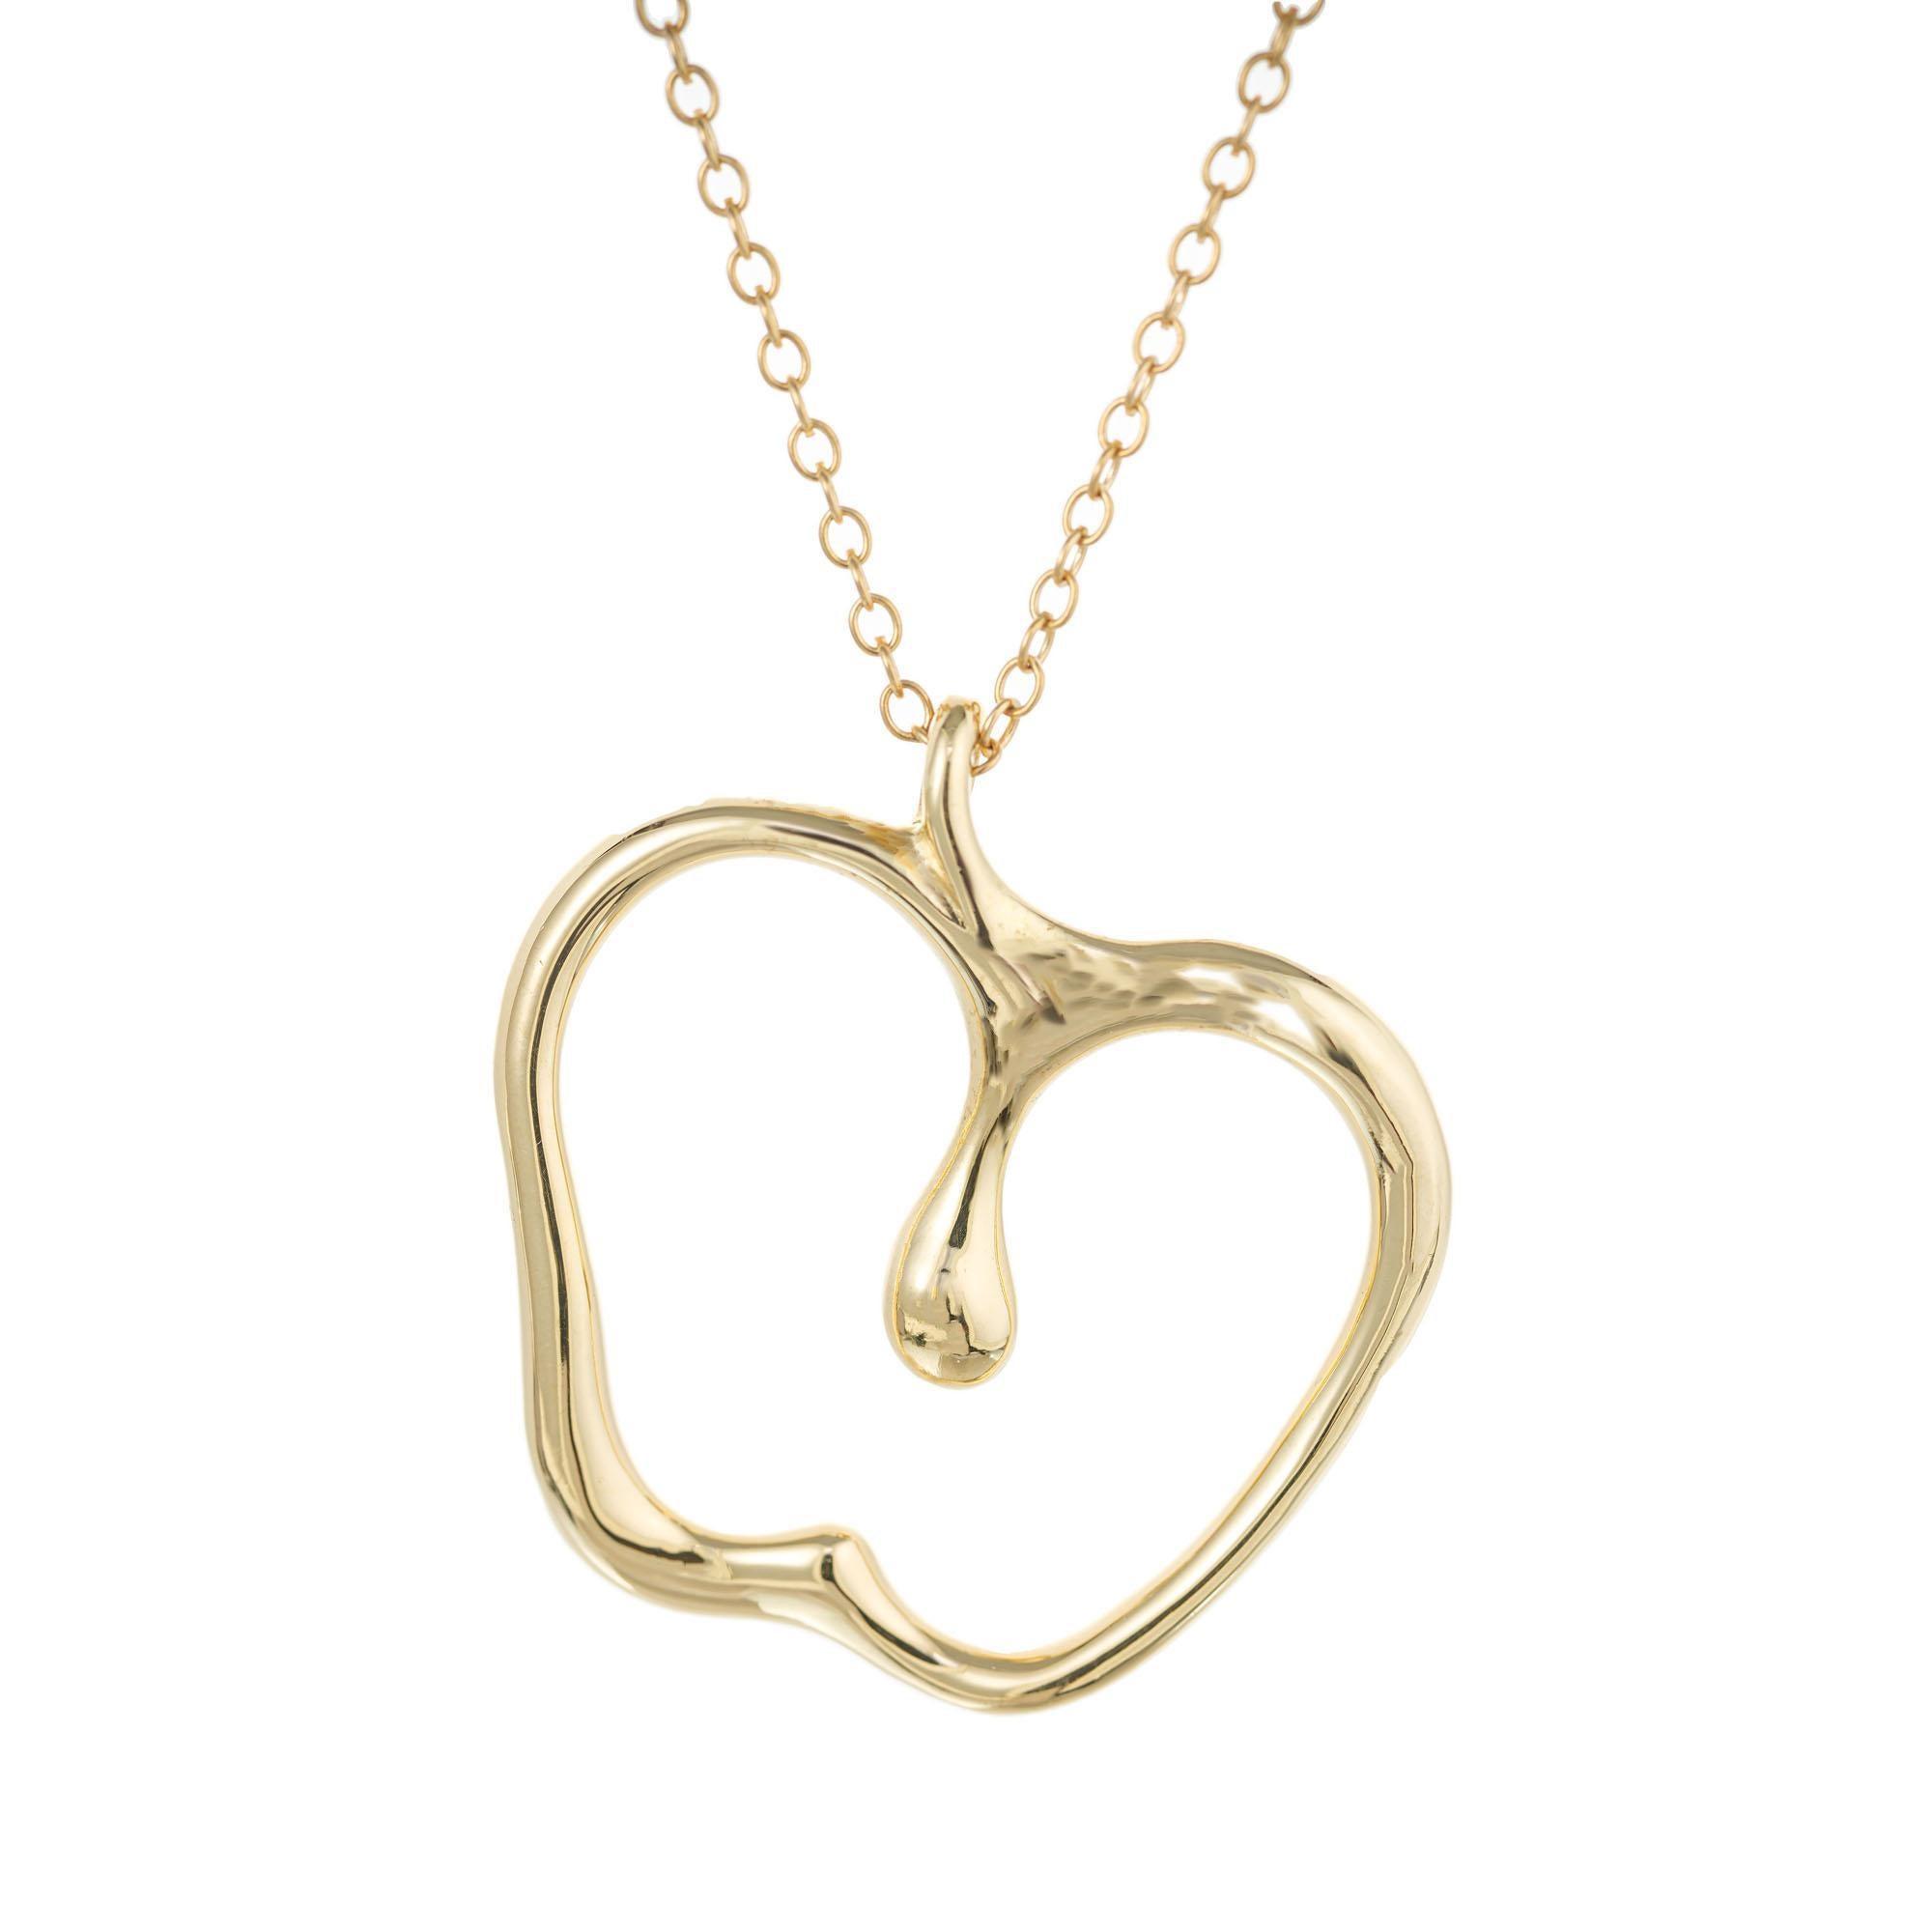 Tiffany & Co. Elsa Peretti Yellow Gold Apple Pendant Necklace